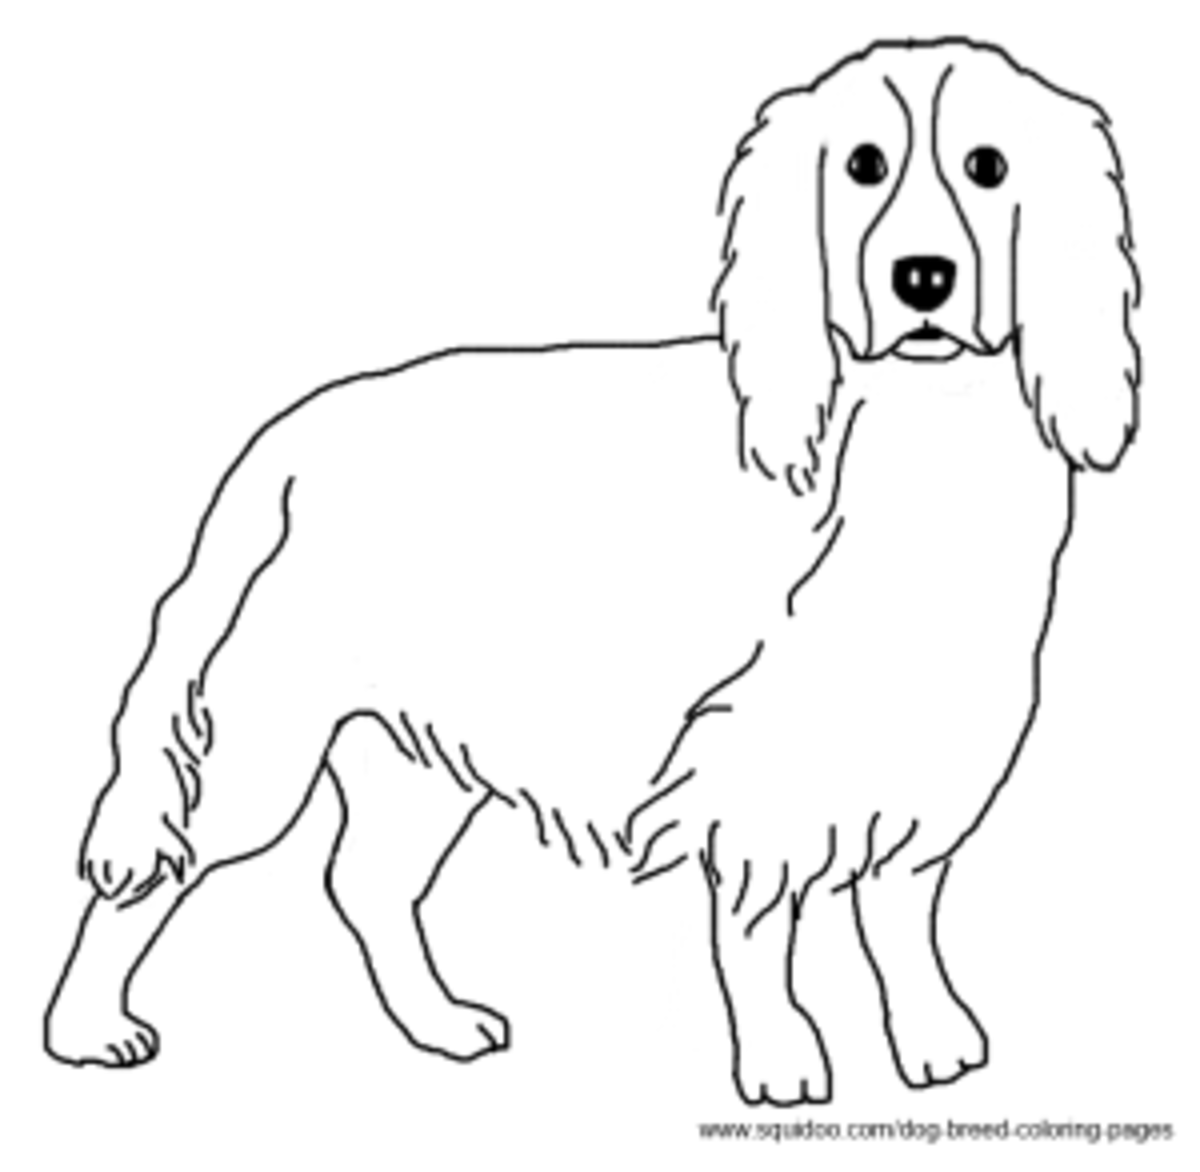 Springer Spaniel coloring page